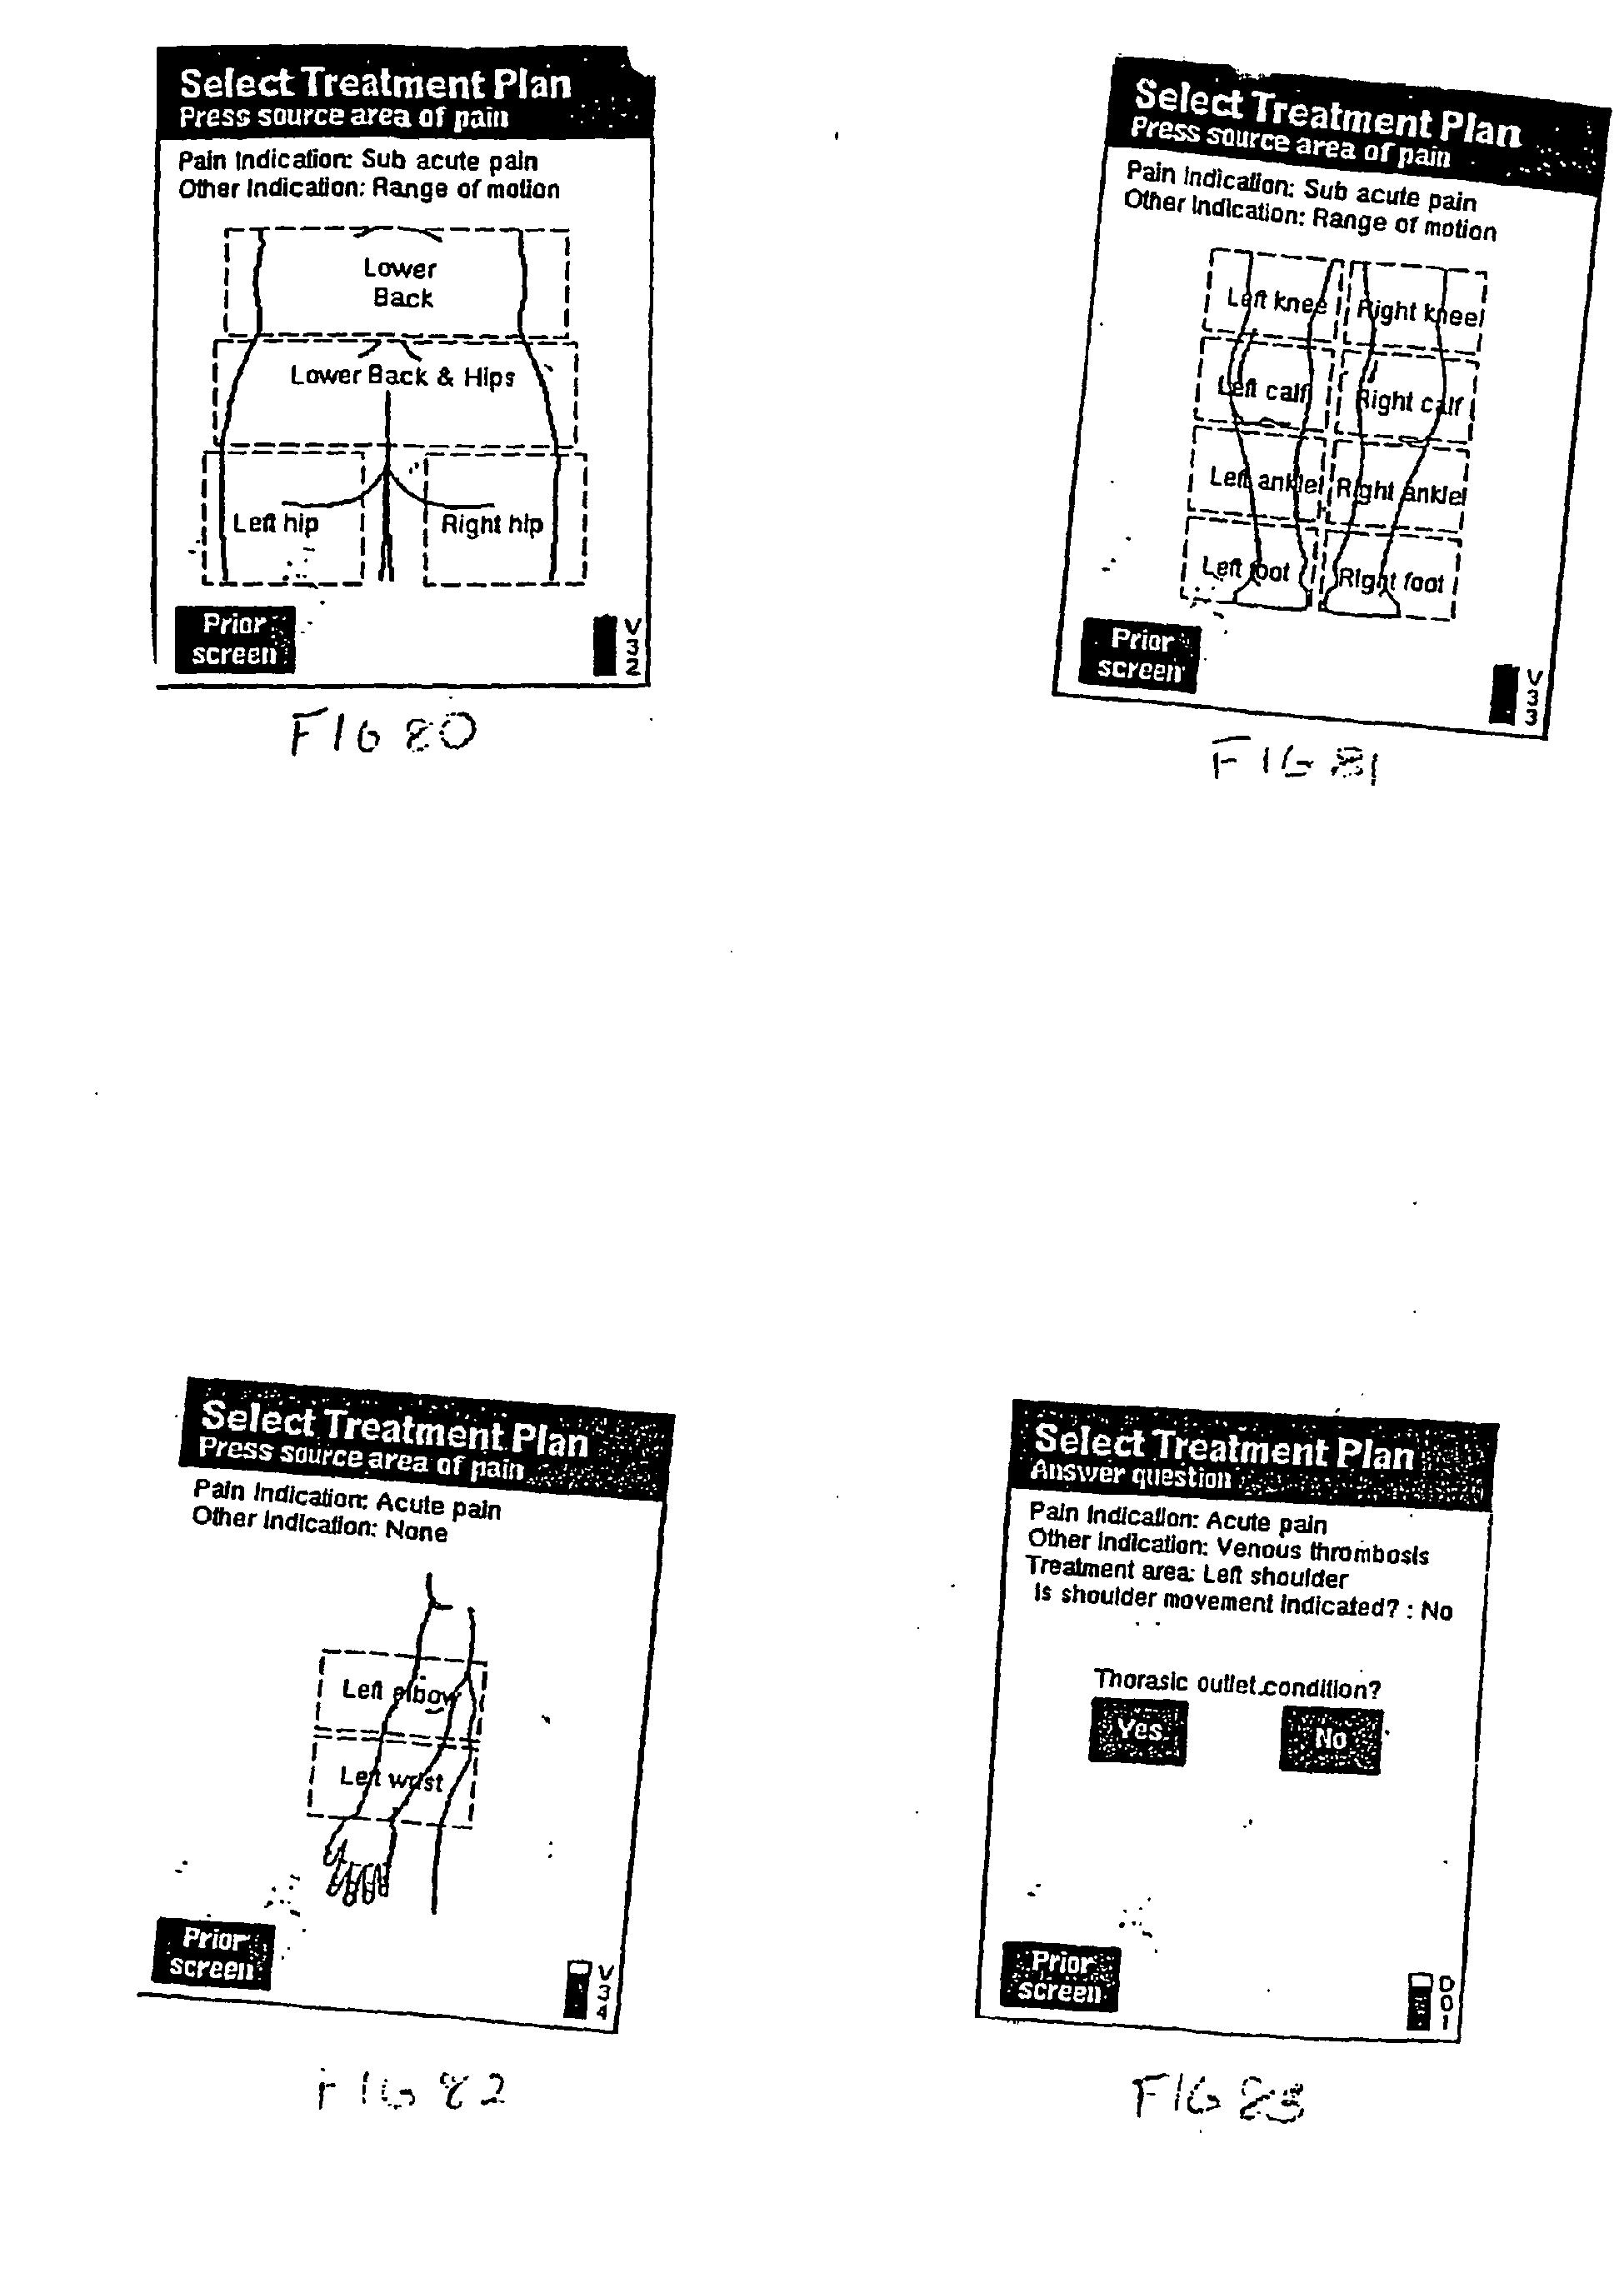 heating pad schematic